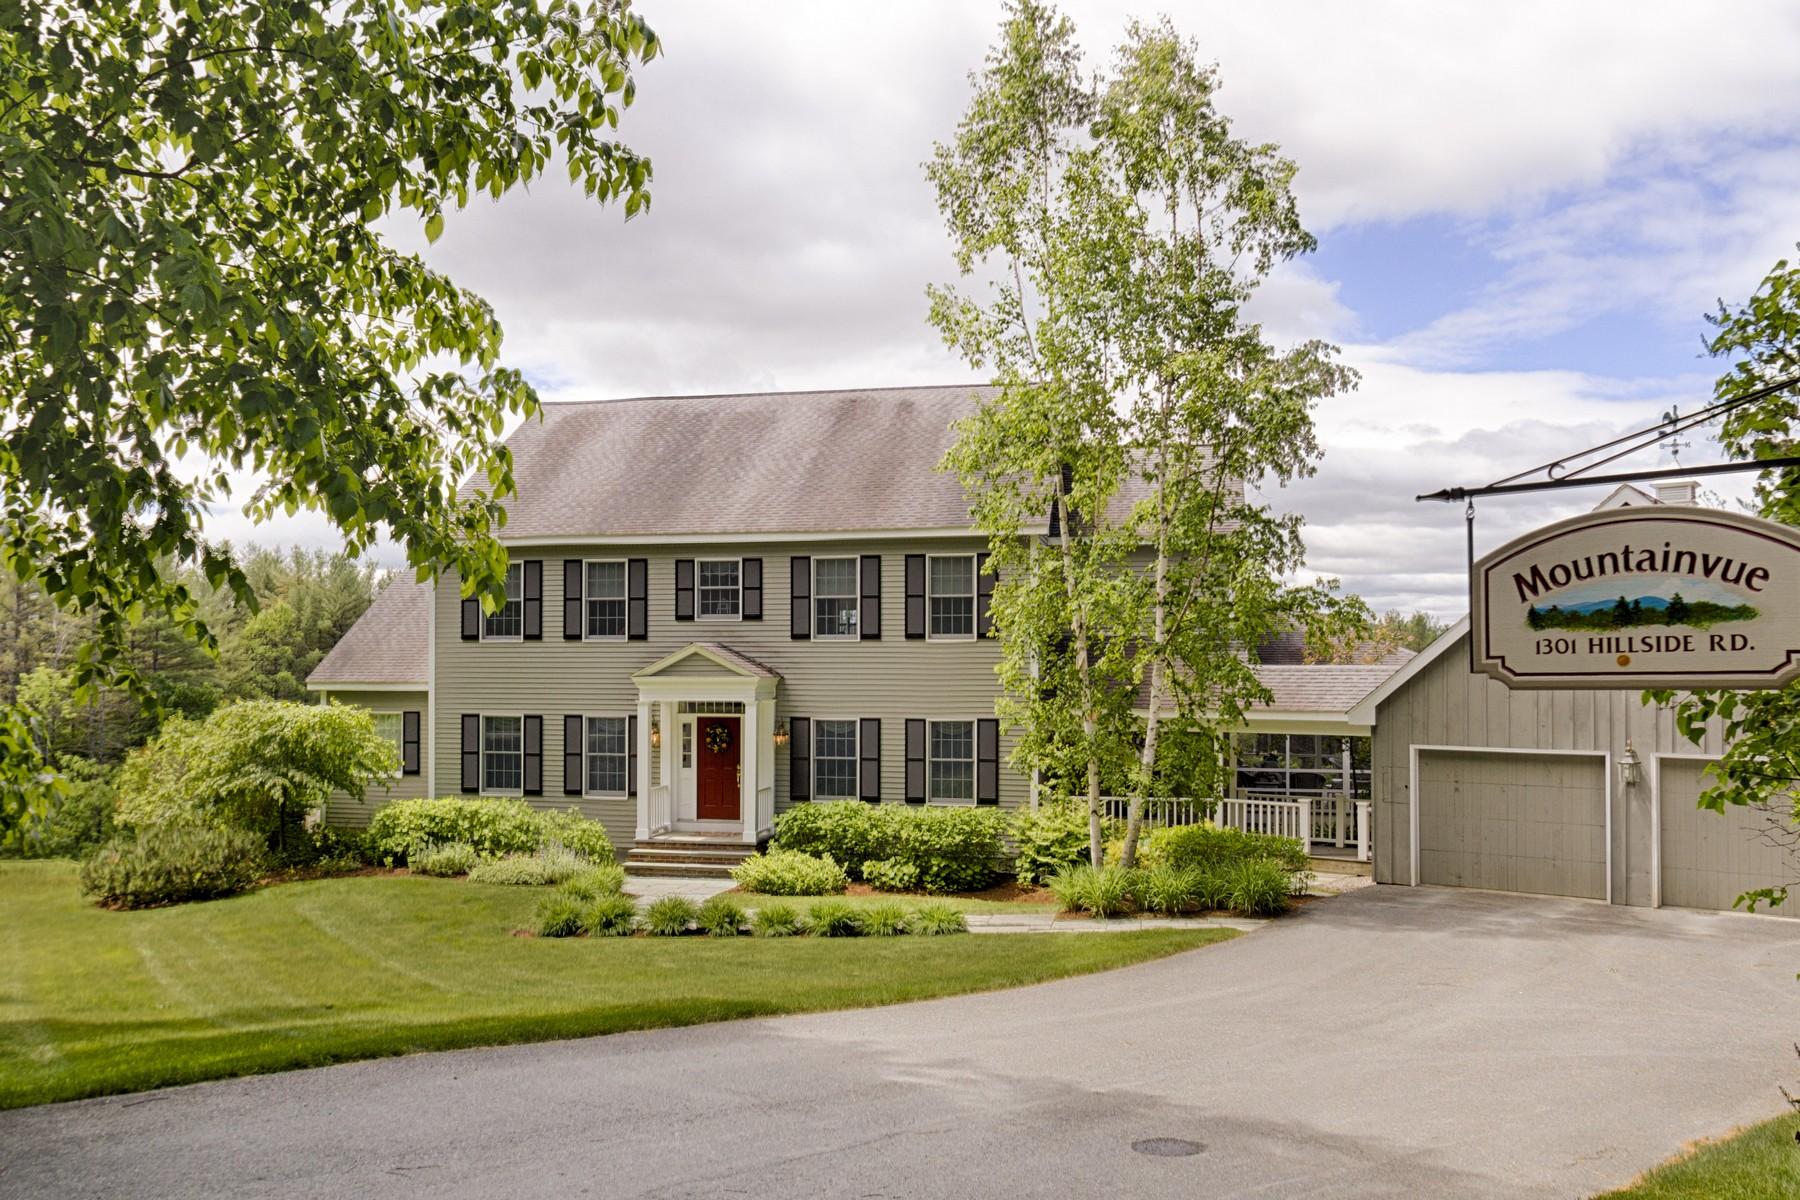 Casa para uma família para Venda às 1301 Hillside Road, Hartford 1301 Hillside Rd Hartford, Vermont, 05059 Estados Unidos